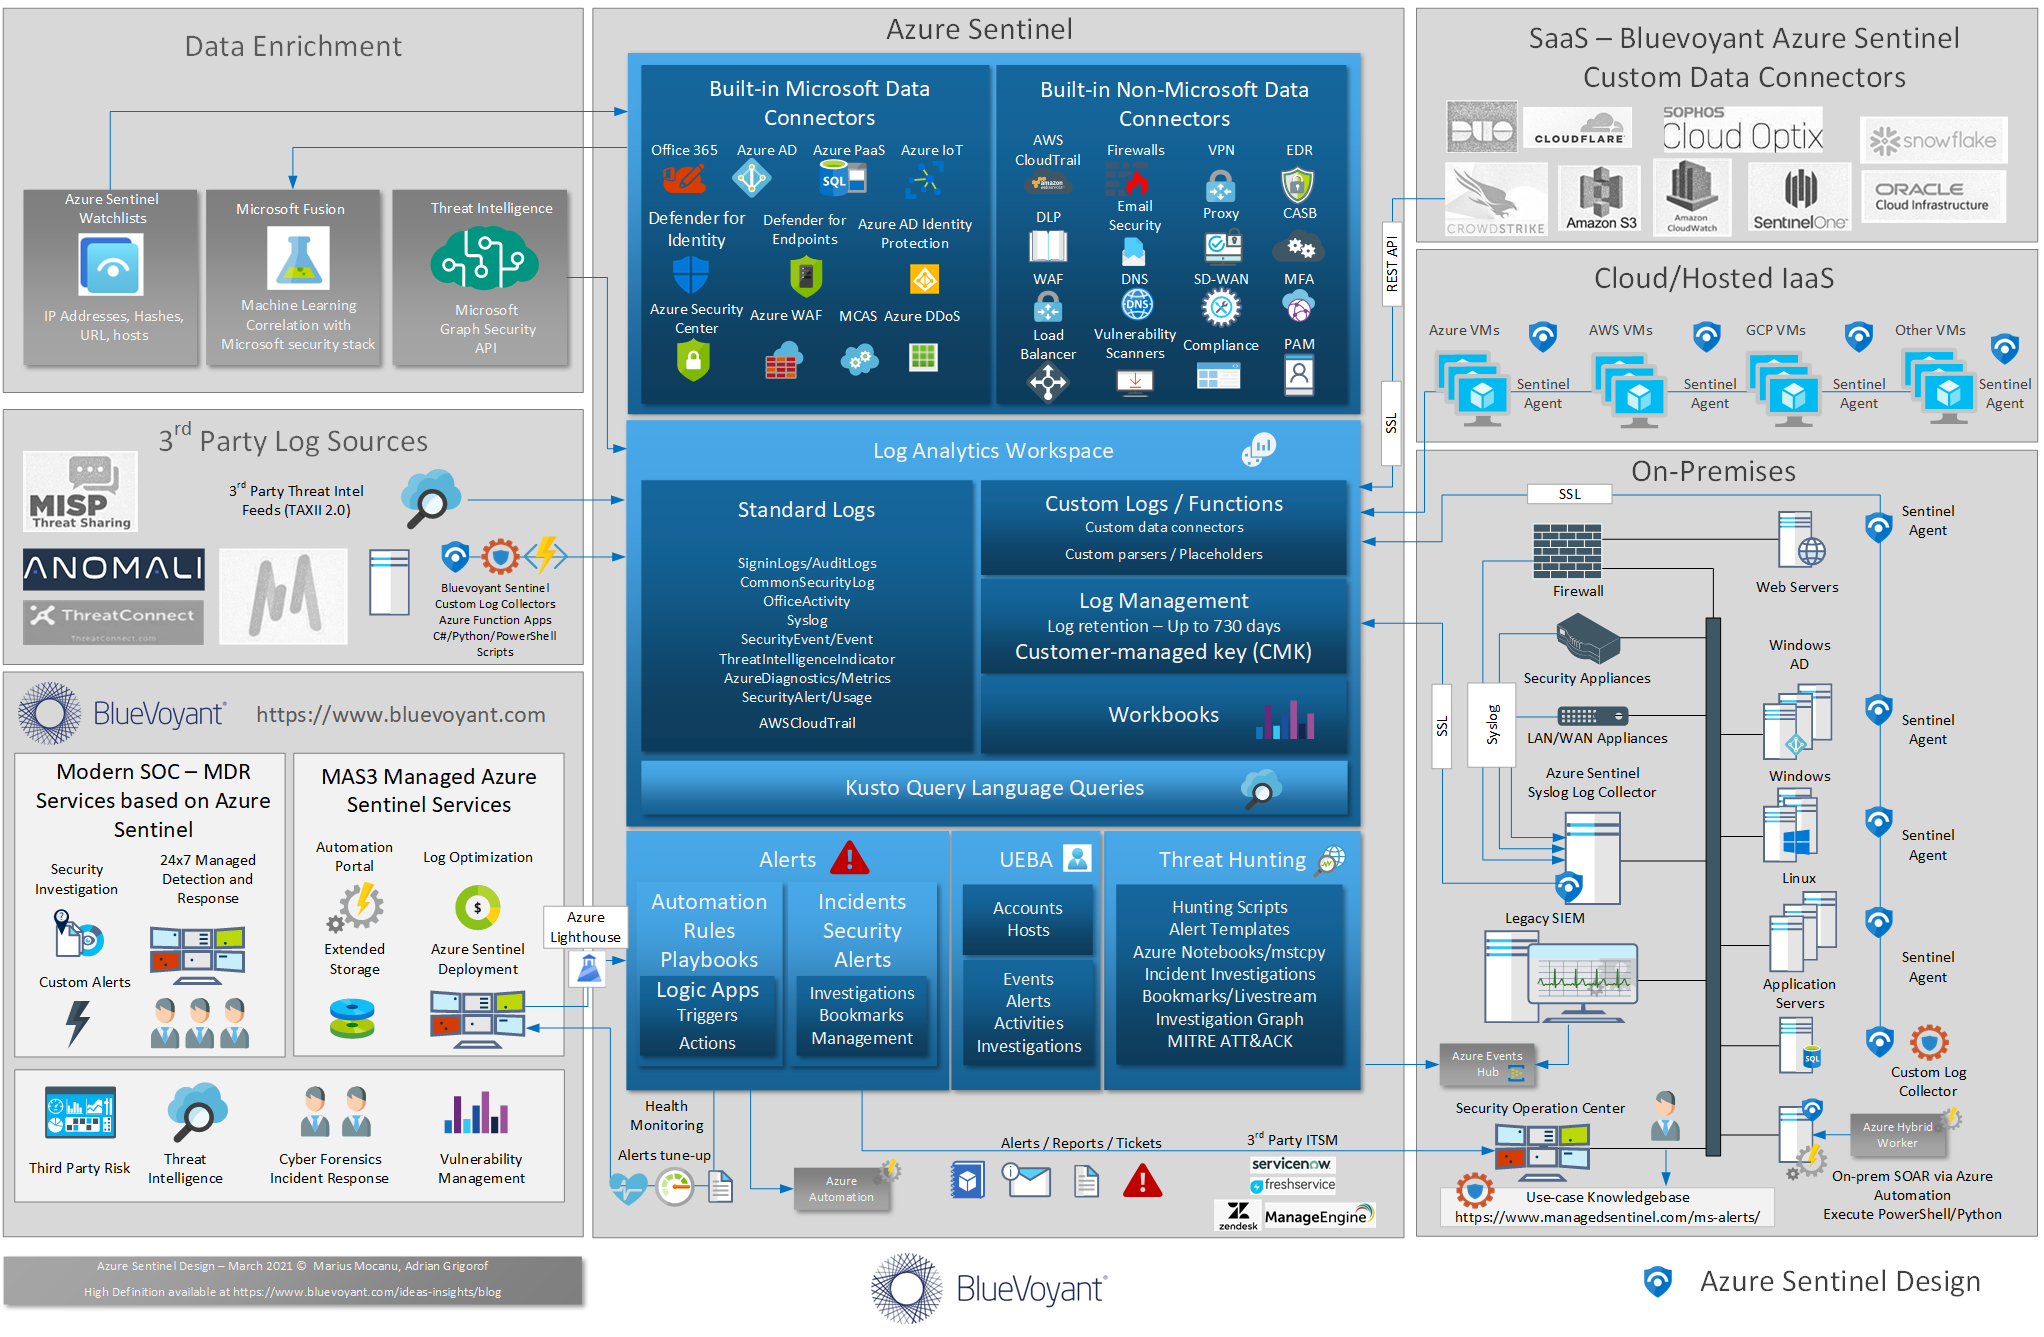 Azure Sentinel Design Update